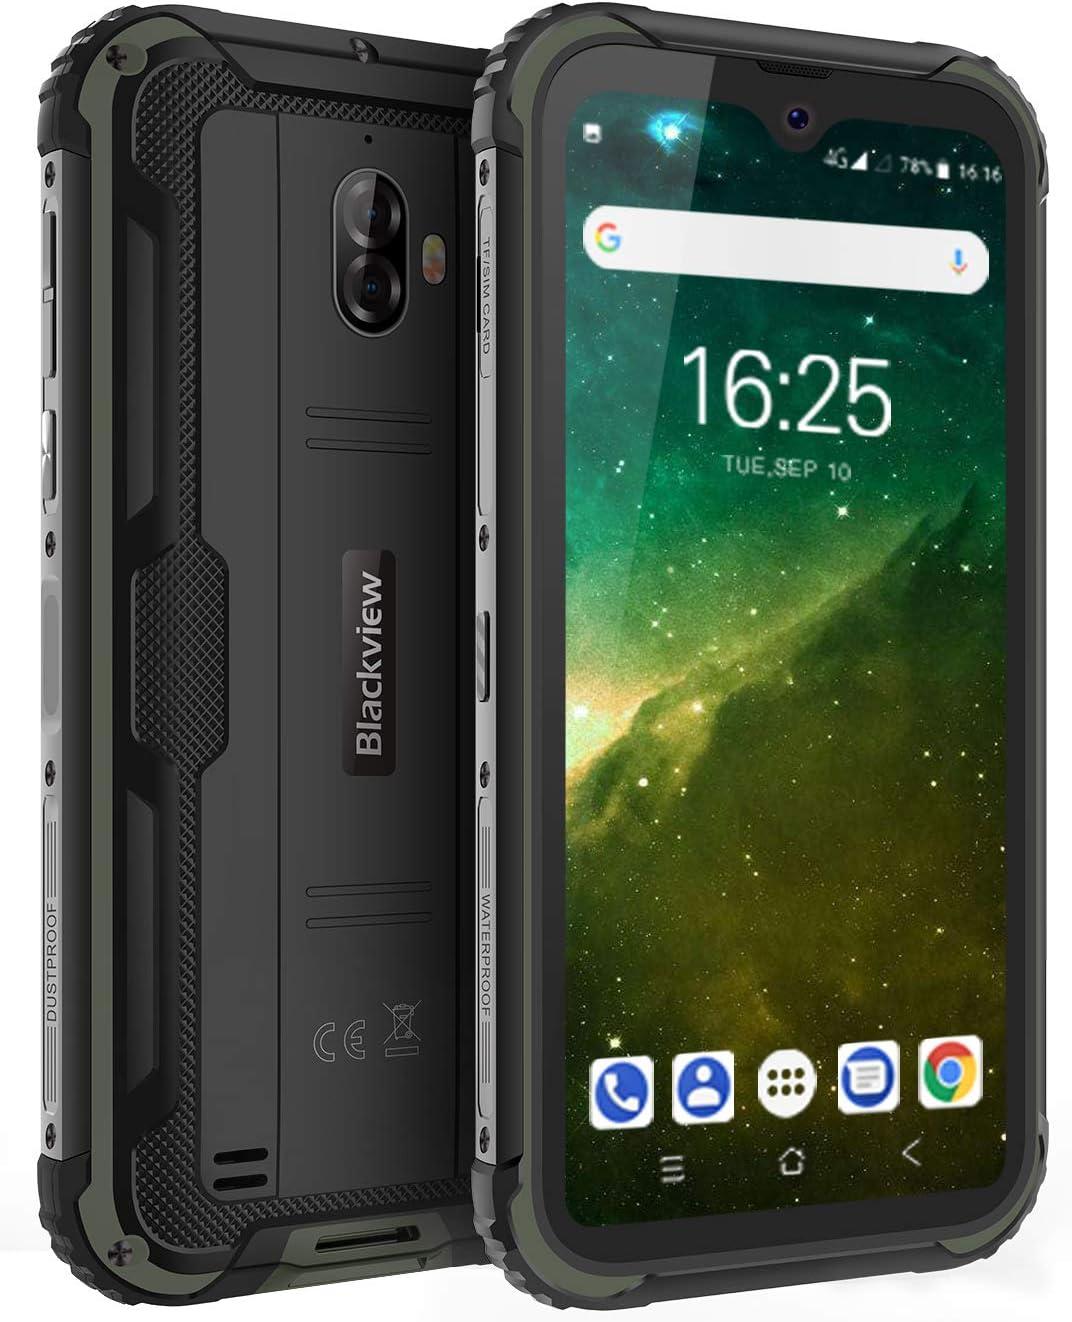 Blackview BV5900 Móvil Libre Resistente, 5,7 Pulgadas HD+ Display, Android 9.0, Batería 5580mAh, 3GB RAM+32GB ROM, Móvil Libre Antigolpes, IP68 Impermeable, Cámara 13MP+5MP, GPS/NFC - Verde